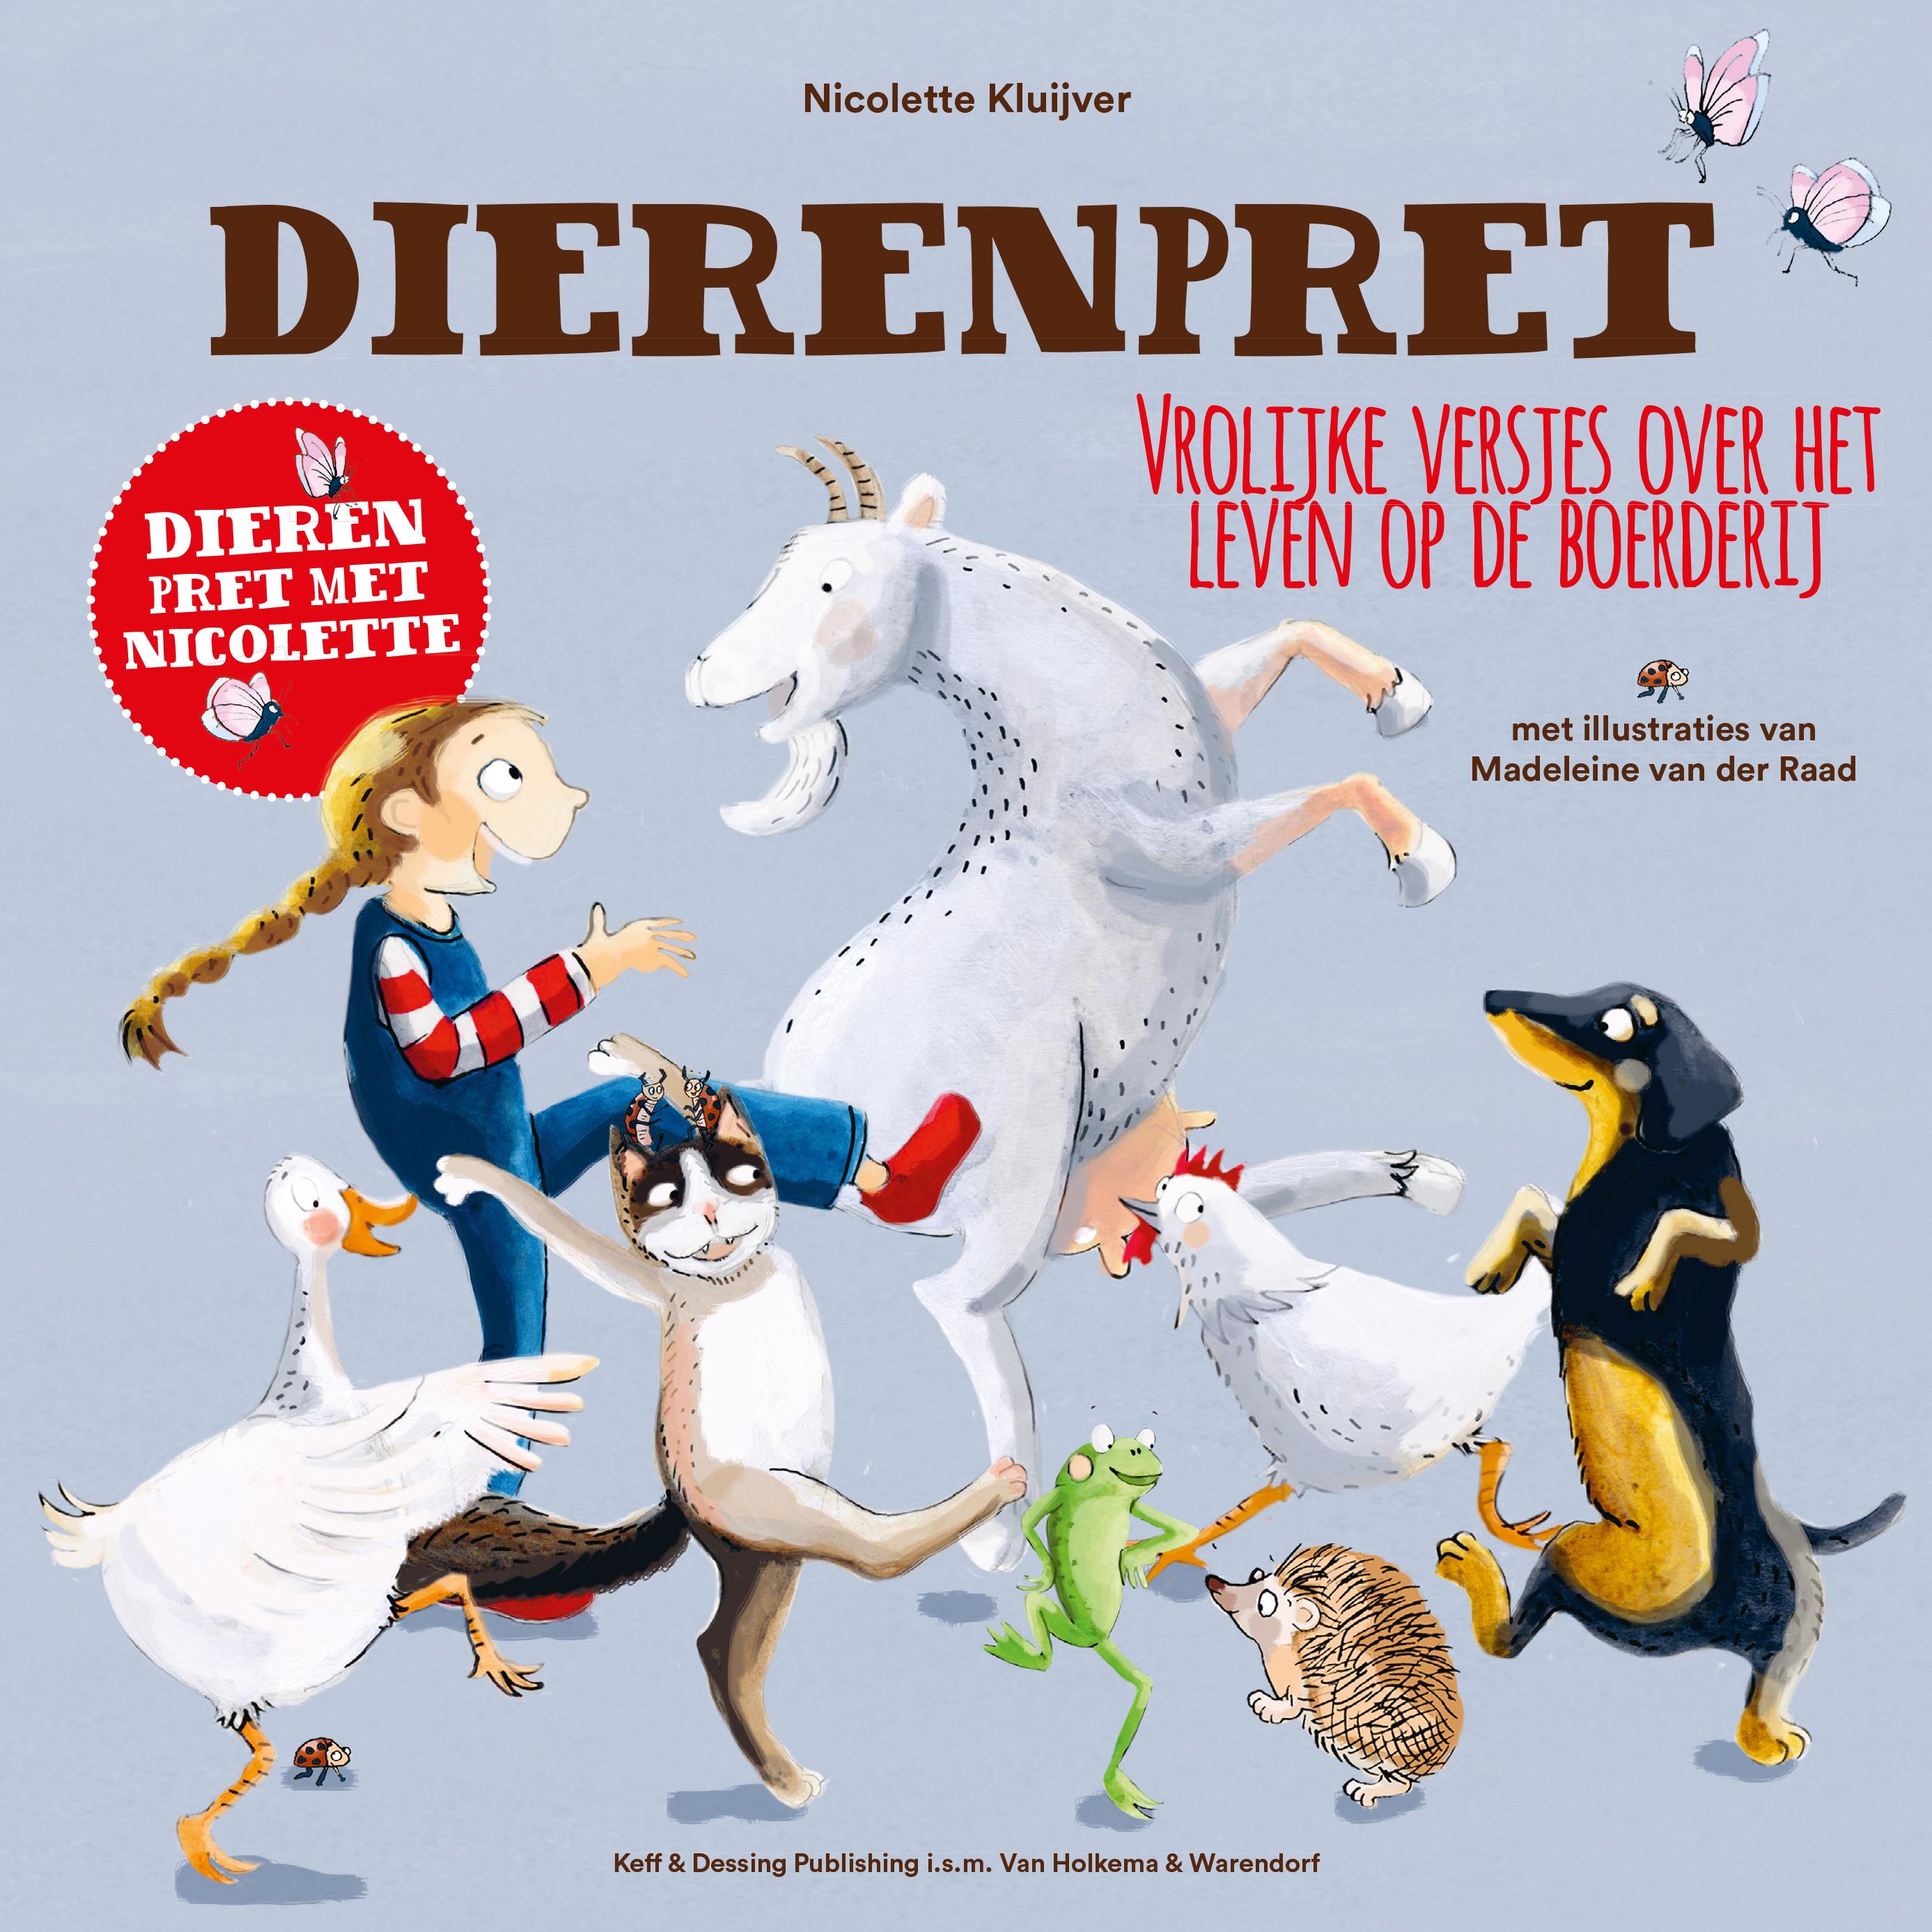 Dierenpret-met-Nicolette-Famme.nl